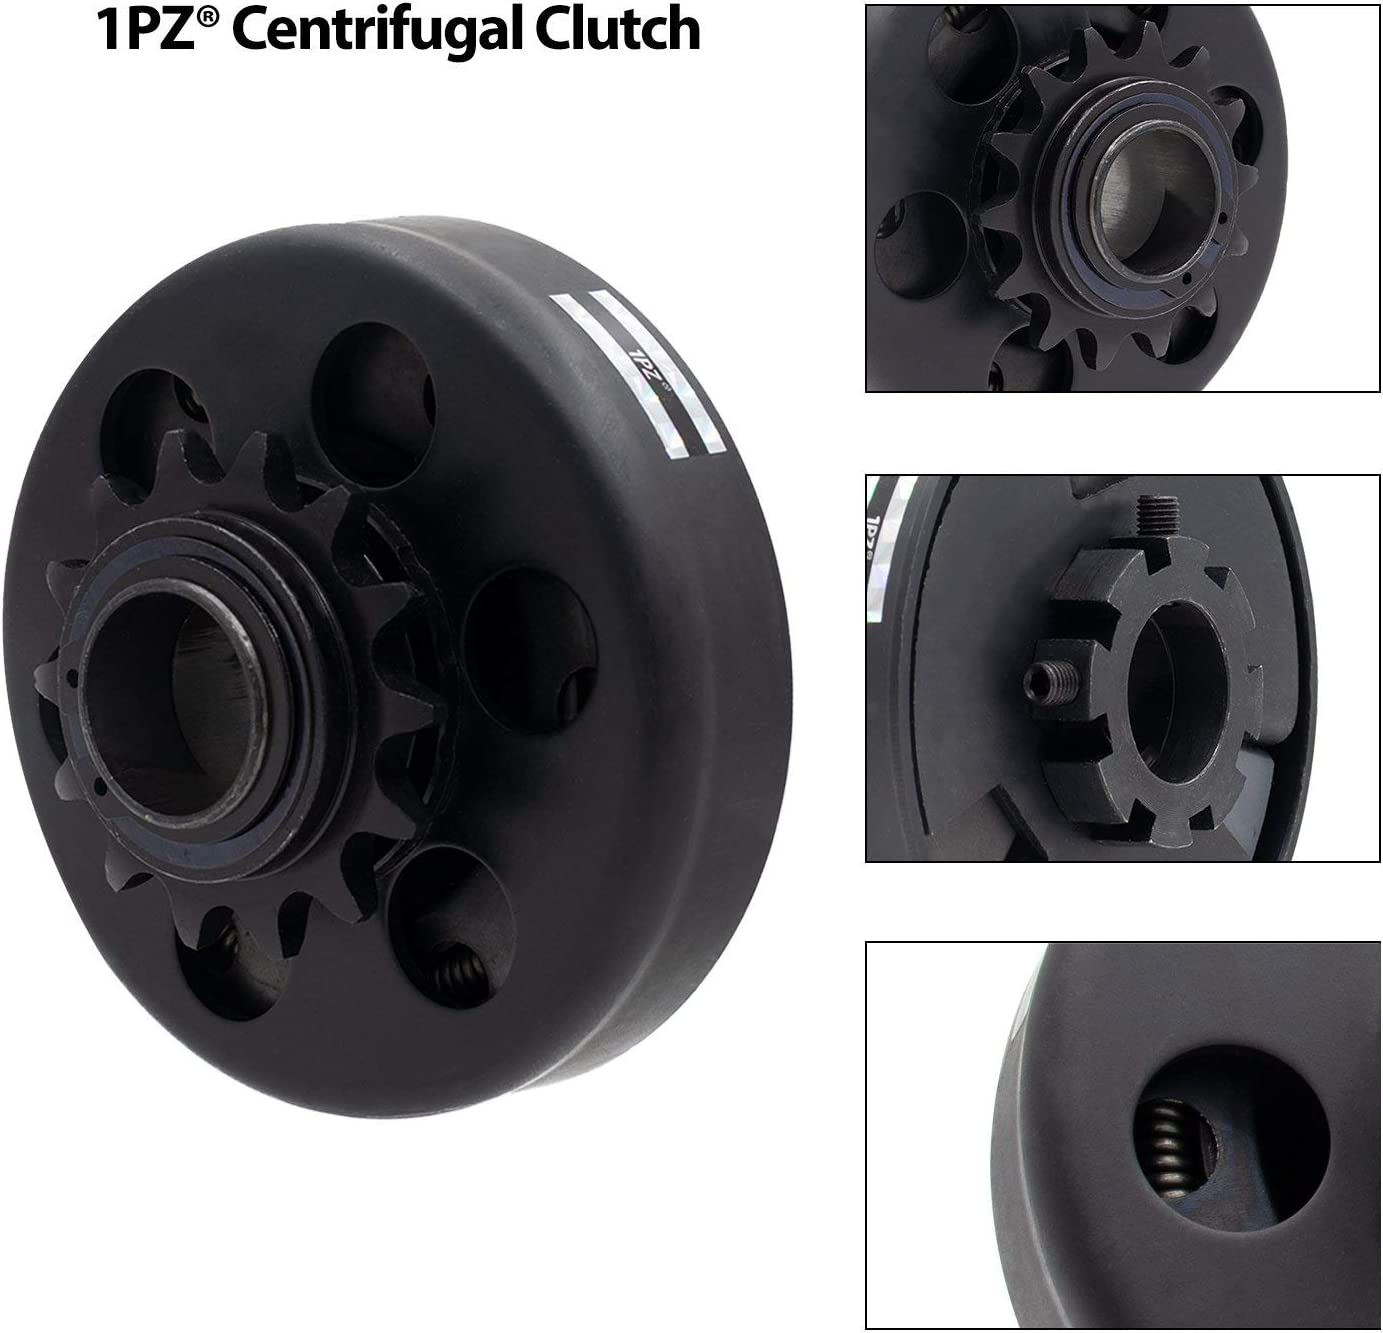 1PZ CA1-14T Centrifugal Clutch 1 Bore 14 Tooth #40//41//420 Chain for Mini Bike Engine